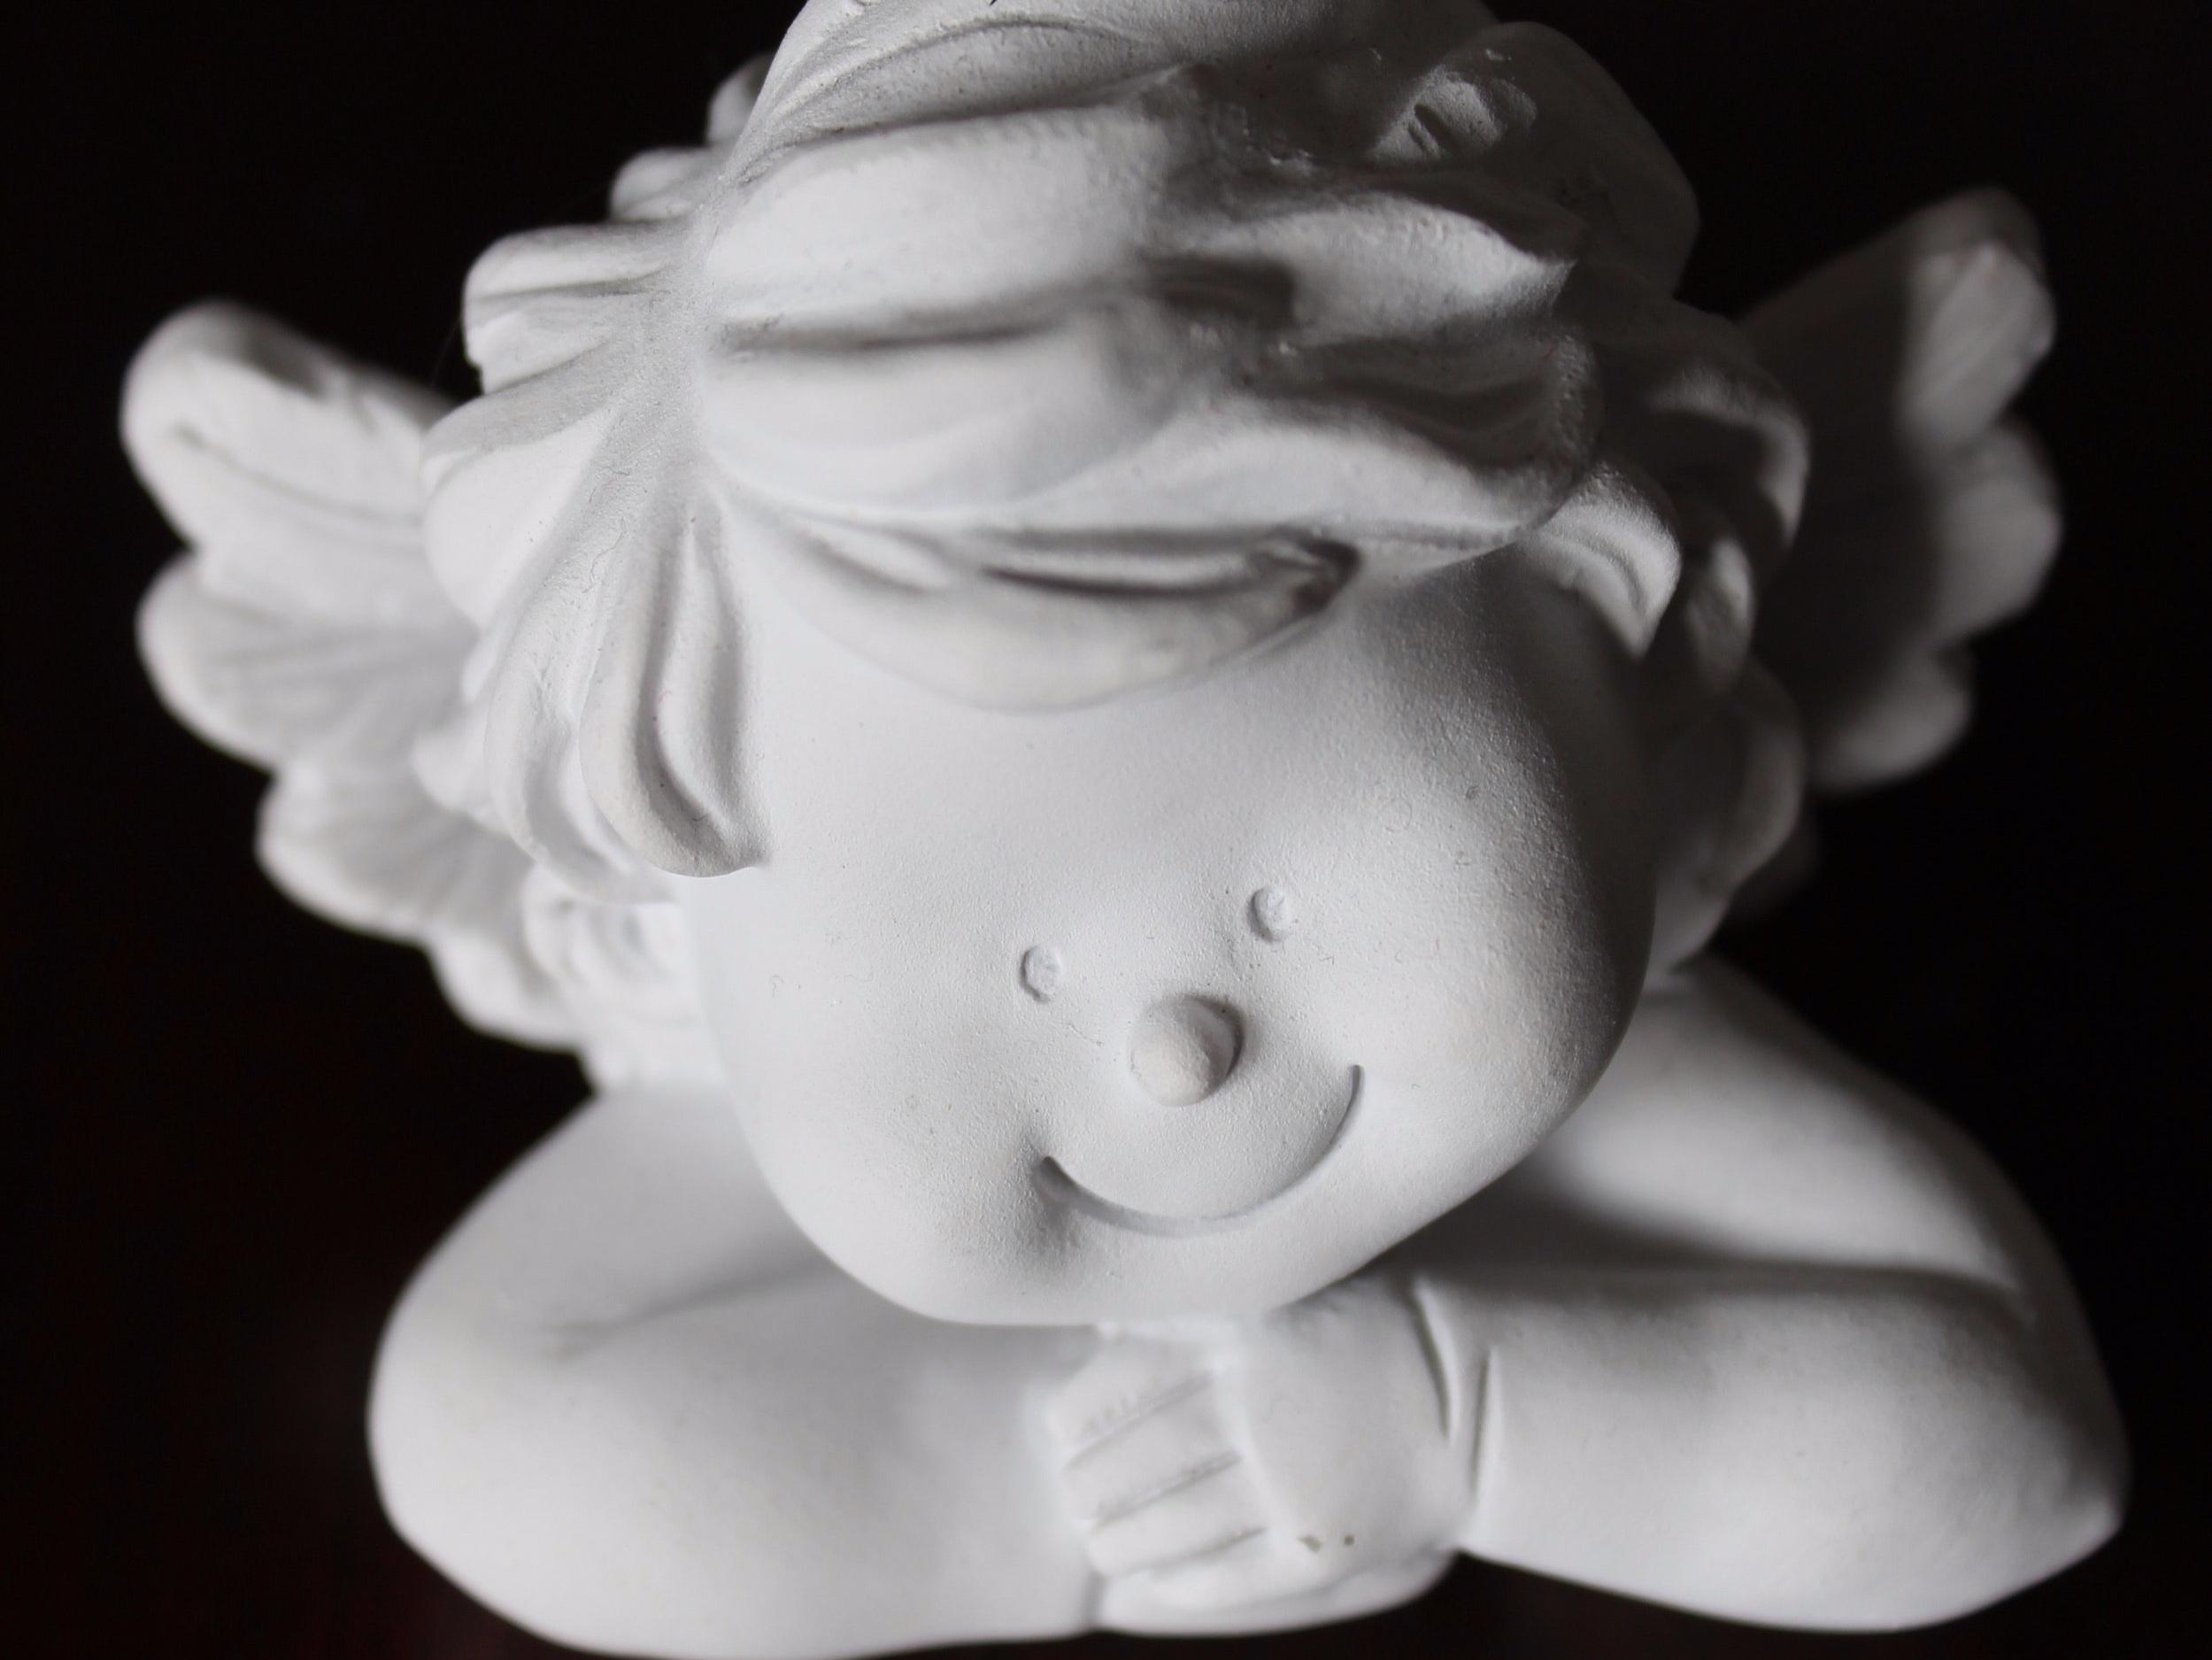 angel-angelic-antique-39014.jpg